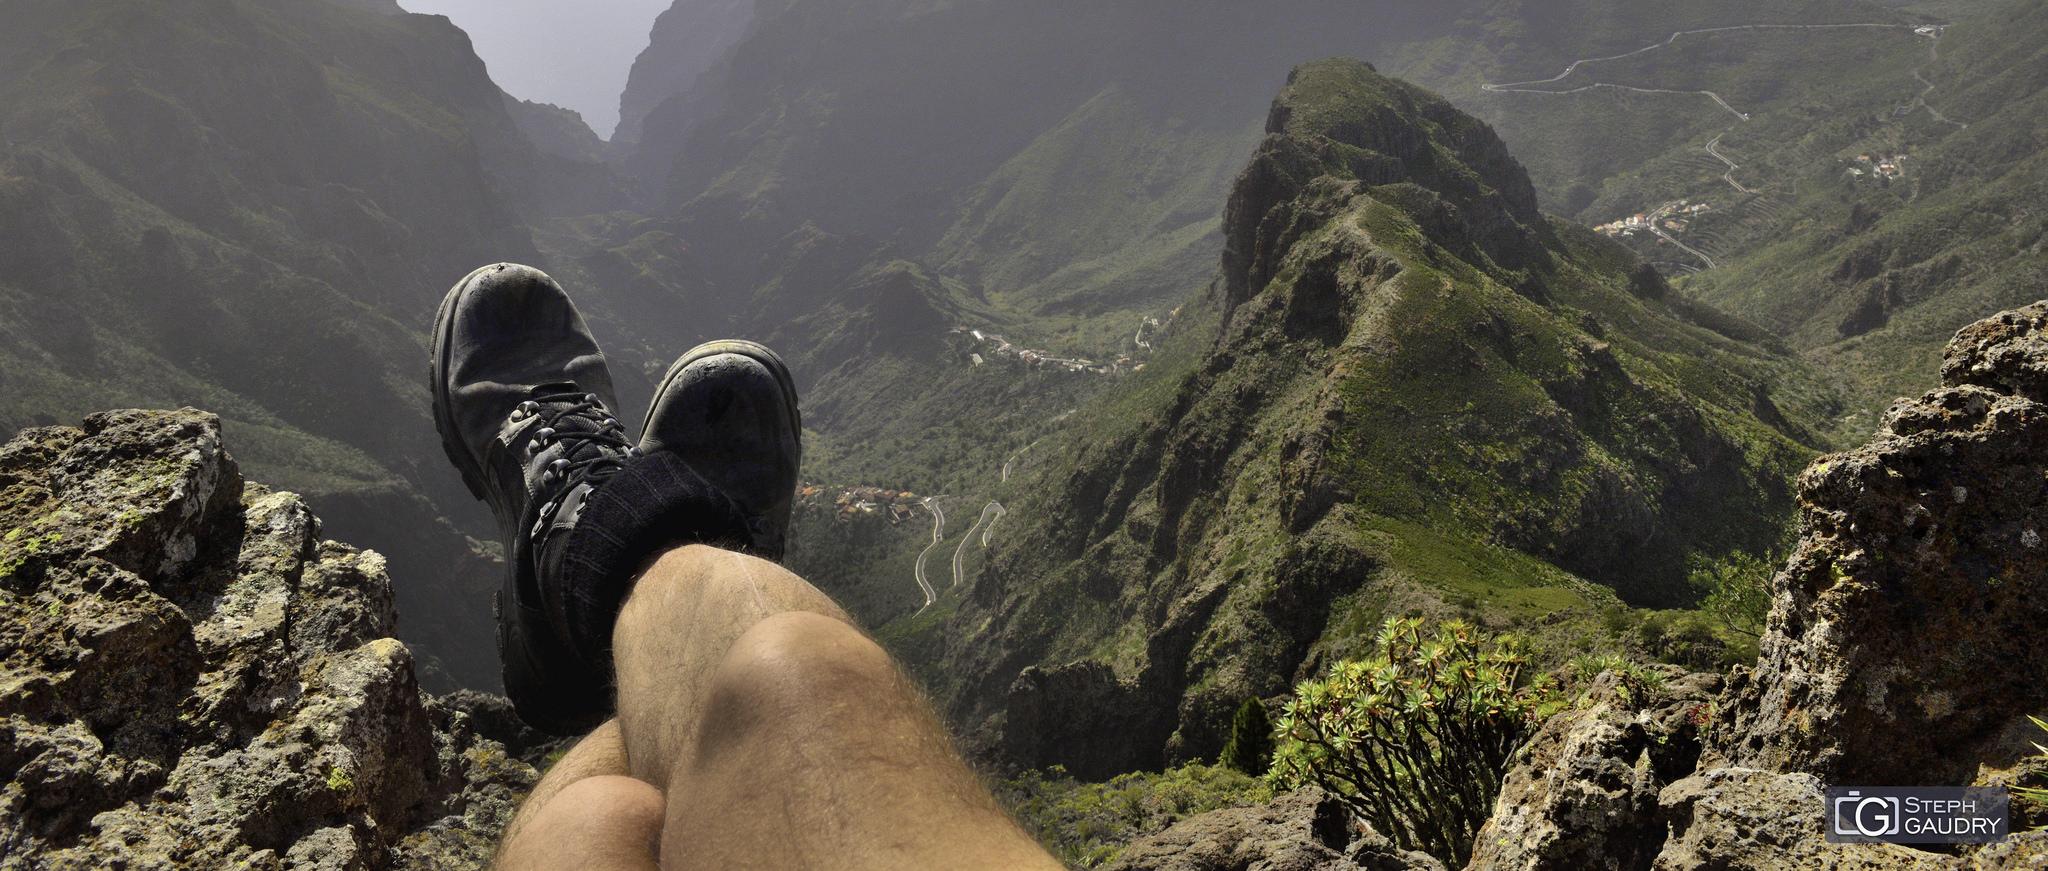 Trekking : El descanso y la vista sobre el Barranco de Masca [Click to start slideshow]